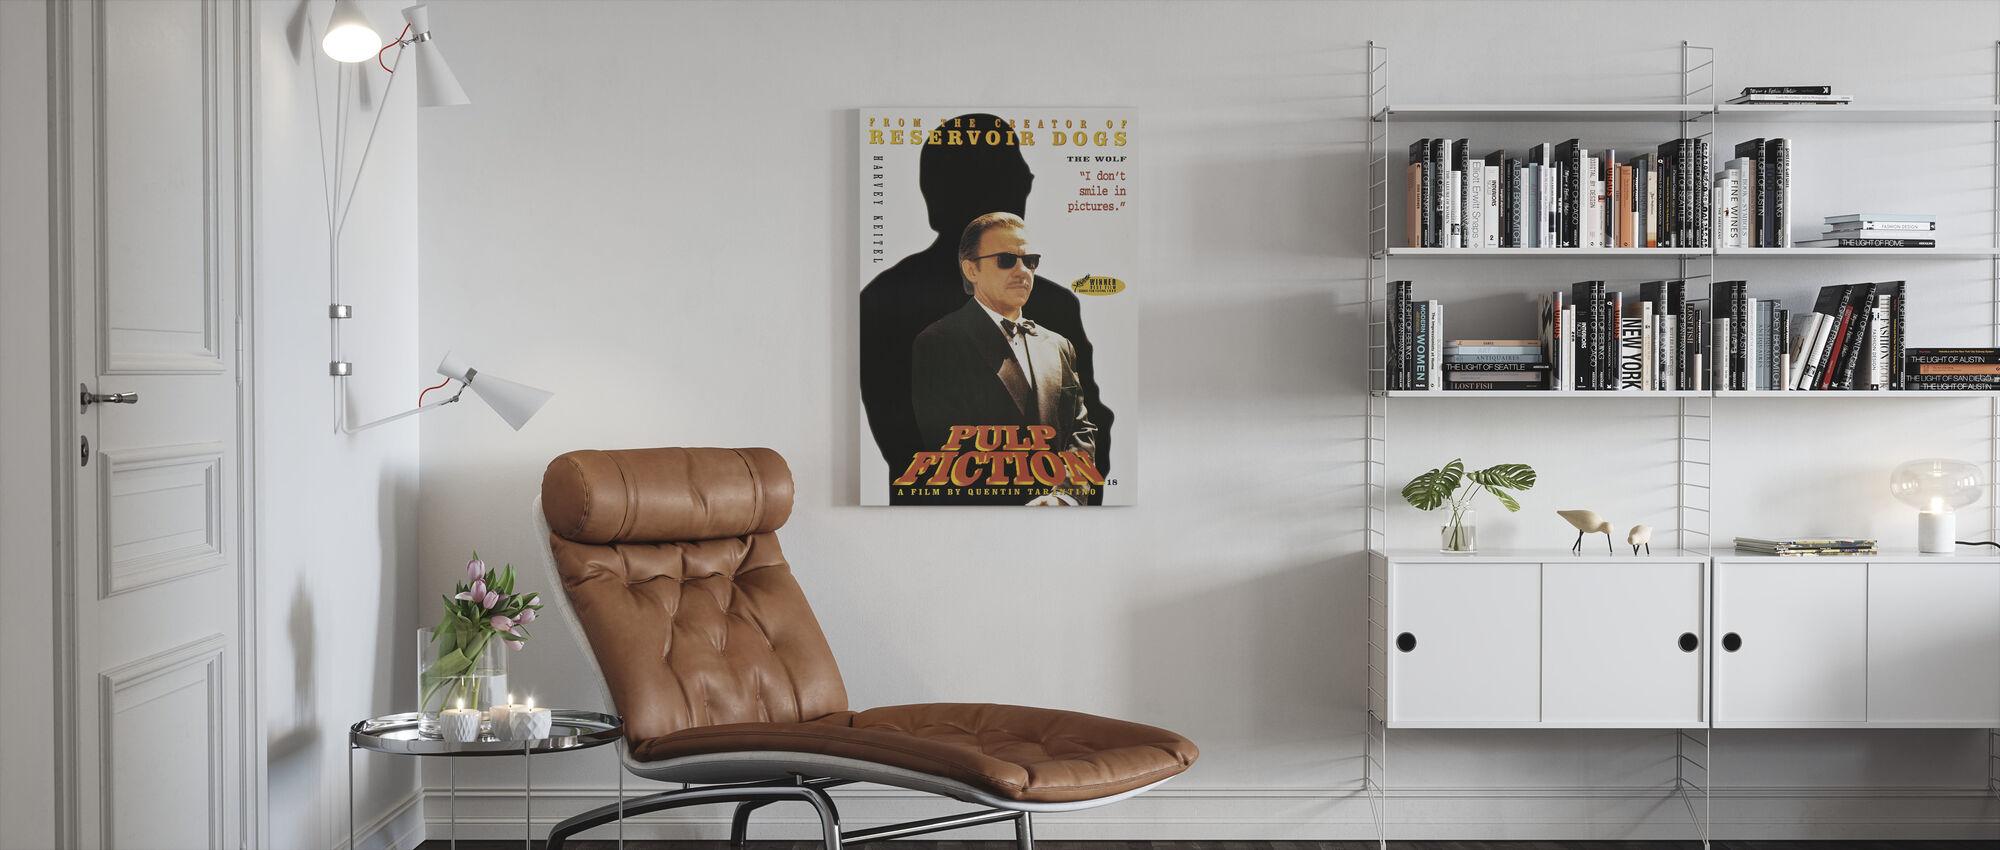 Harvey Keitel in Pulp Fiction - Canvas print - Living Room